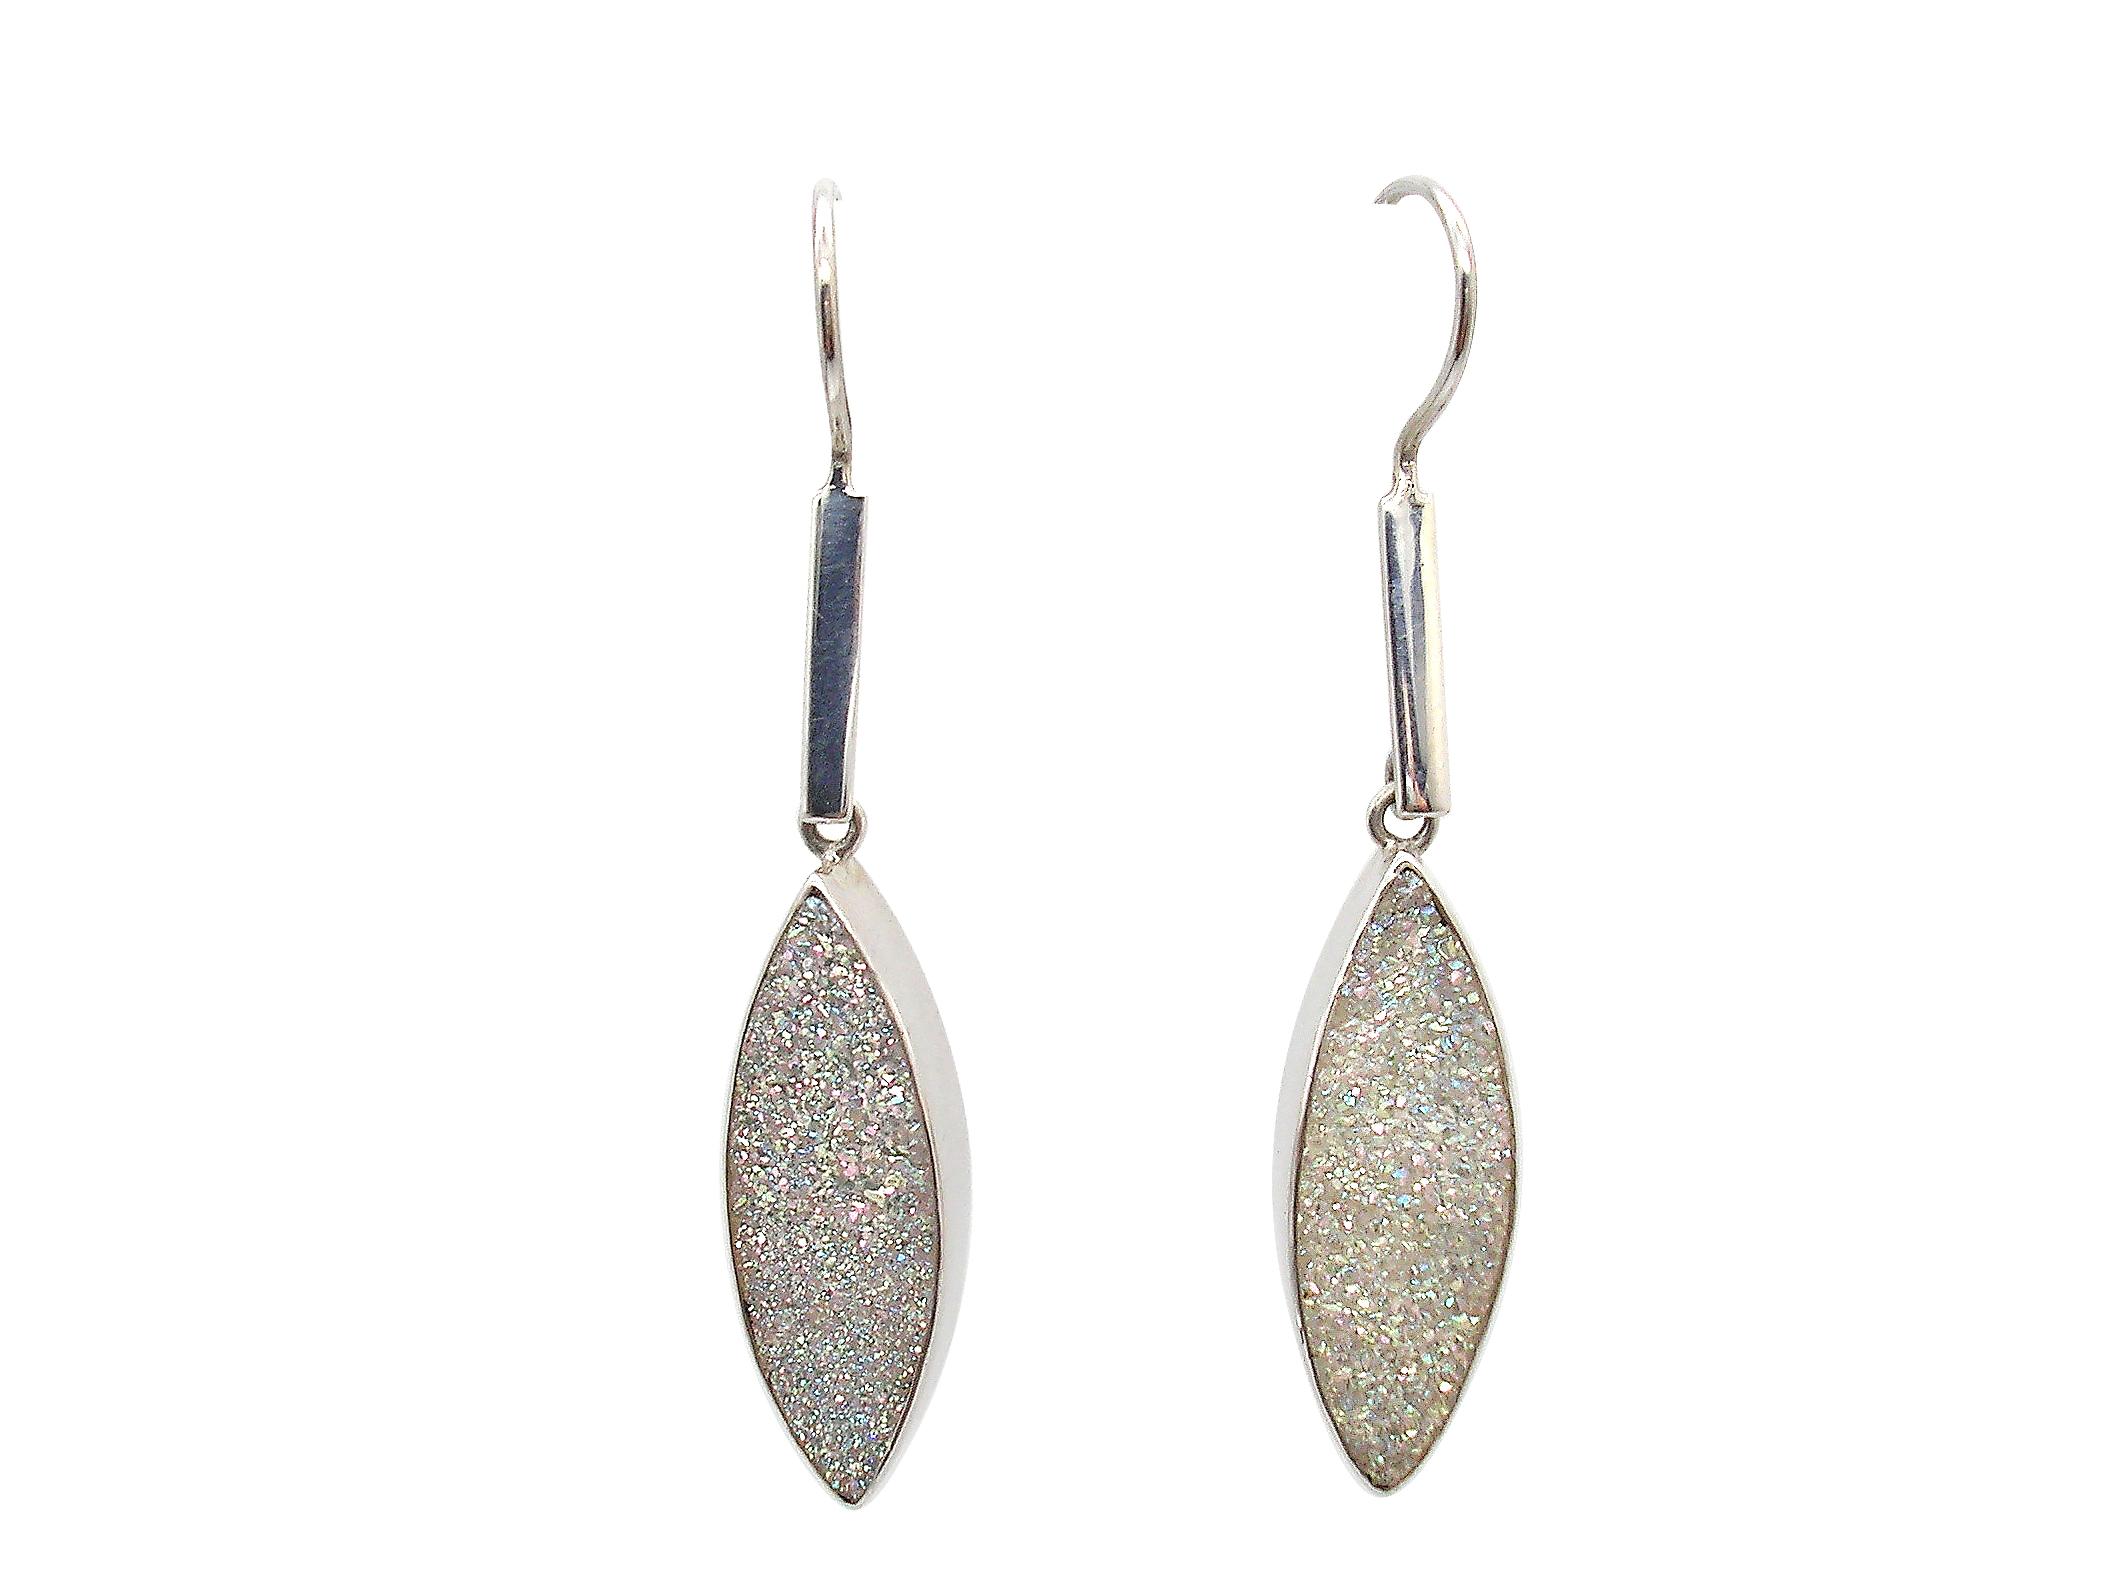 Ohrhänger in Silber verarbeitet